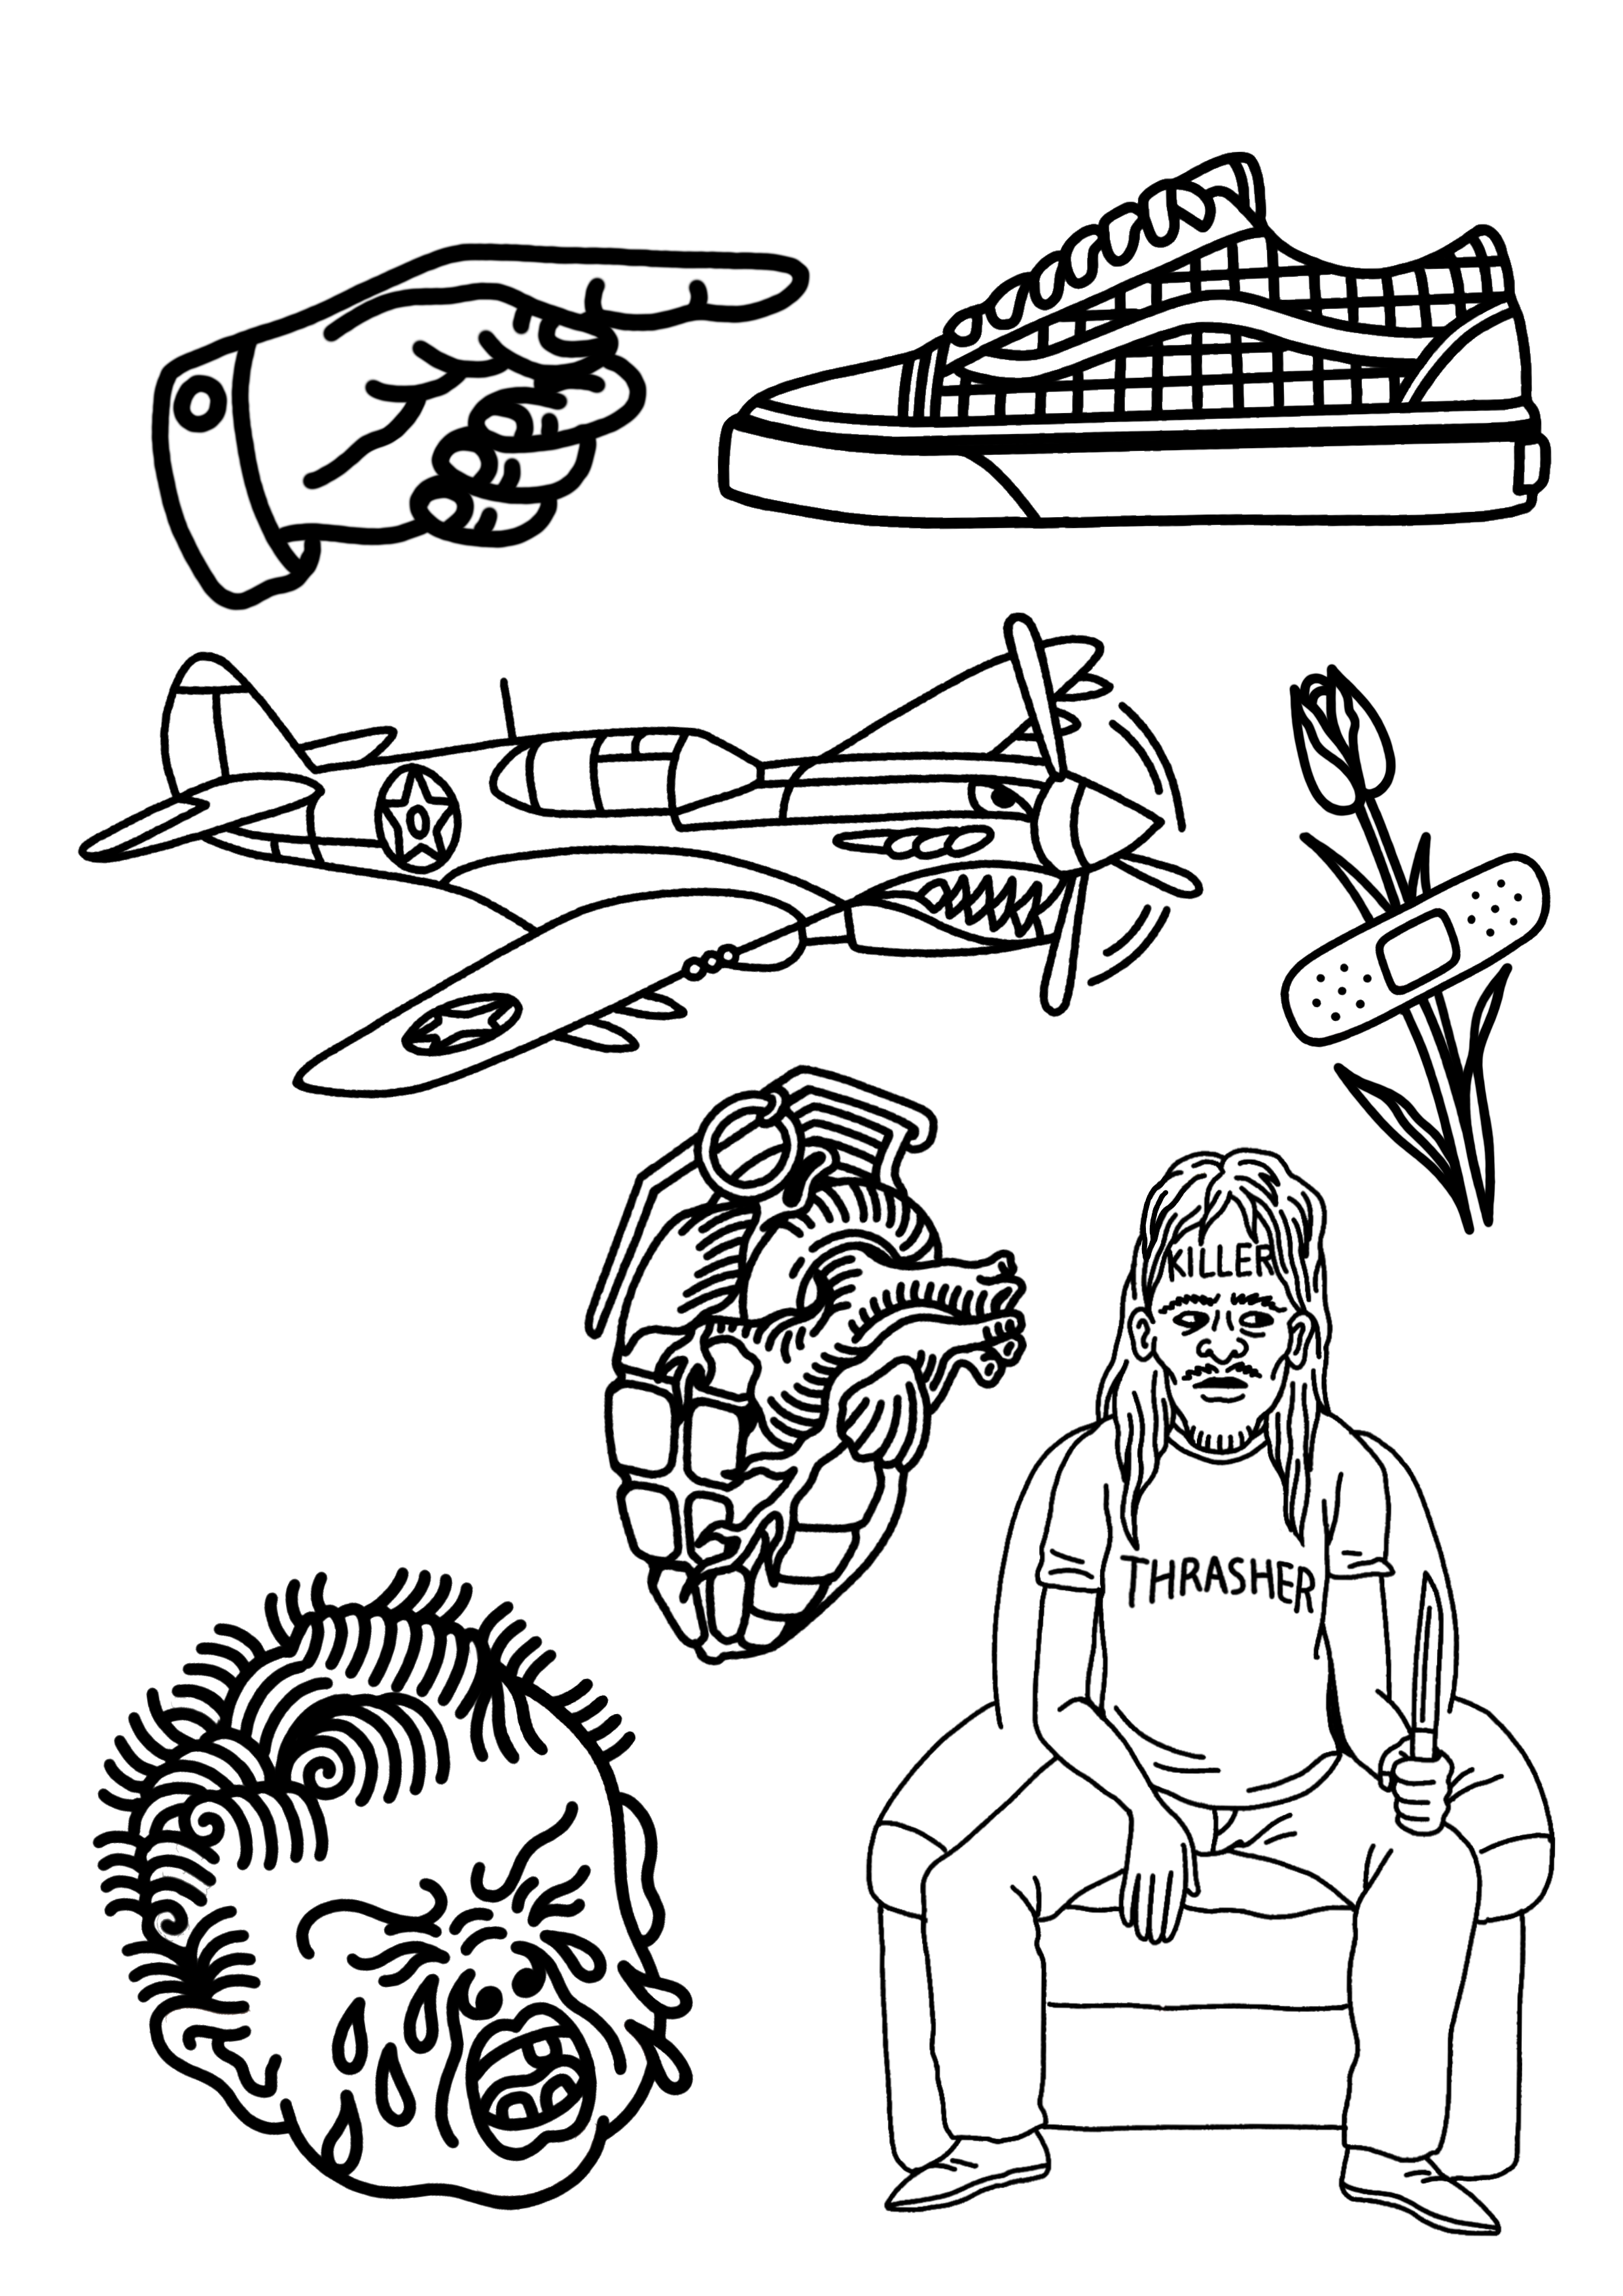 Bocetos De Tatuajes Tradicionales pin de dennys hidalgo en tatuajes | tatuajes raros, tatuajes